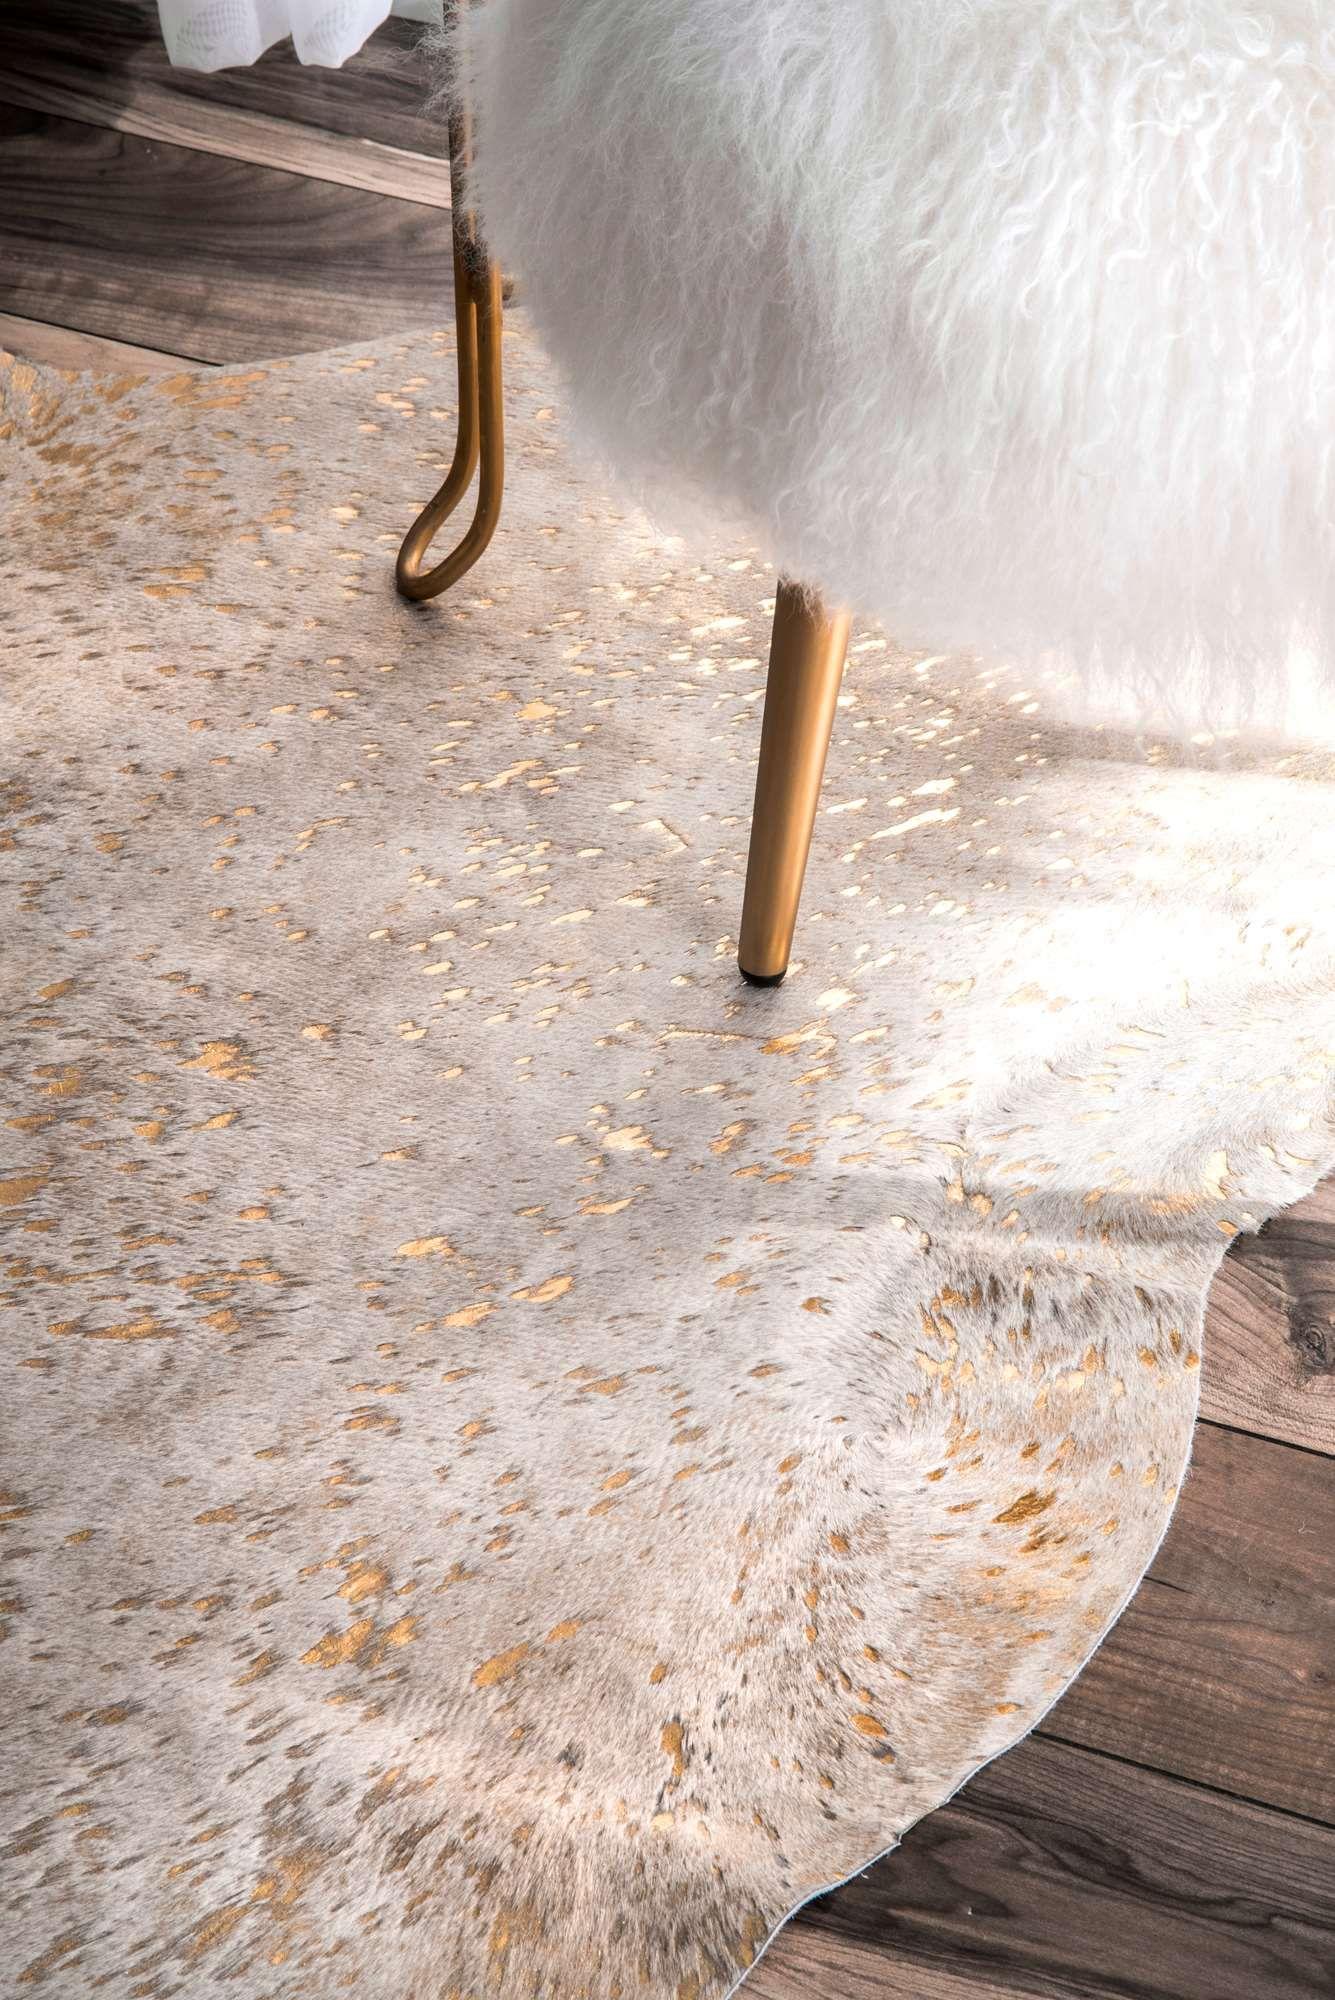 Rugs Usa Metallic Beige Silk Screen Devour Cowhide Rug Animal Prints Shaped 5 X 7 Cowhide Rug Decor Animal Rug